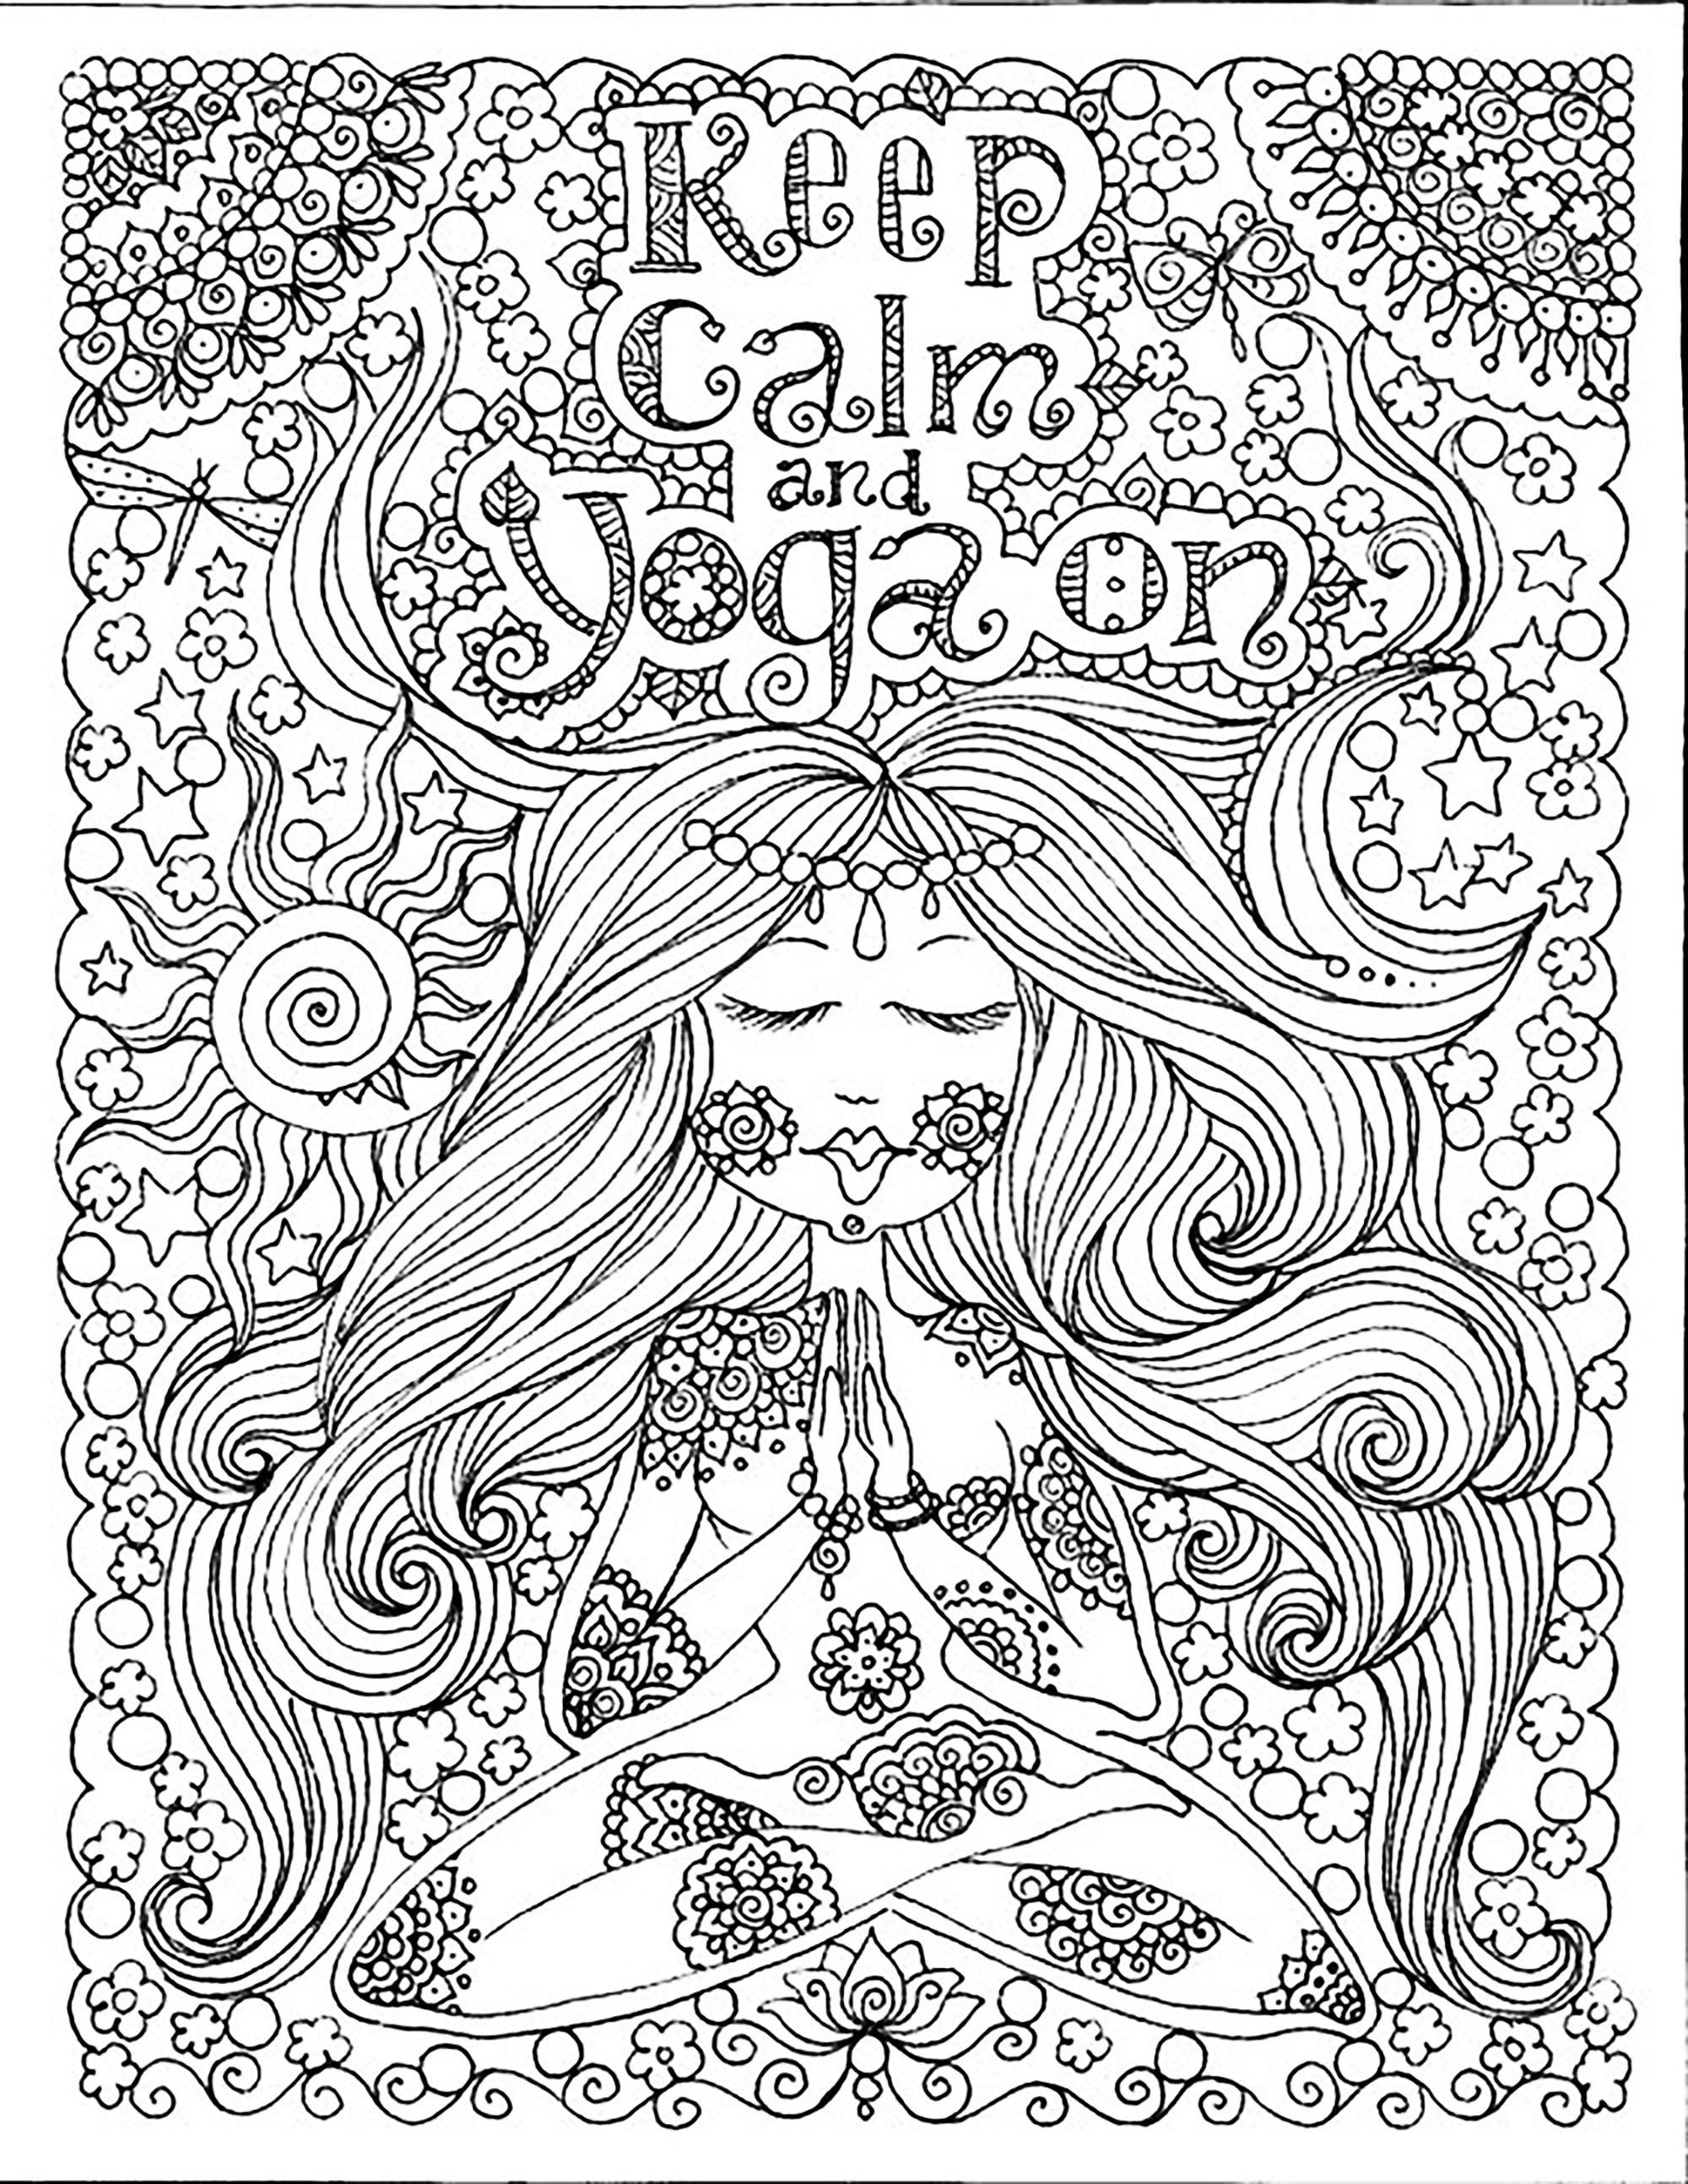 'Keep calm and do Yoga'A partir de la galerie : Anti StressArtiste : Deborah Muller